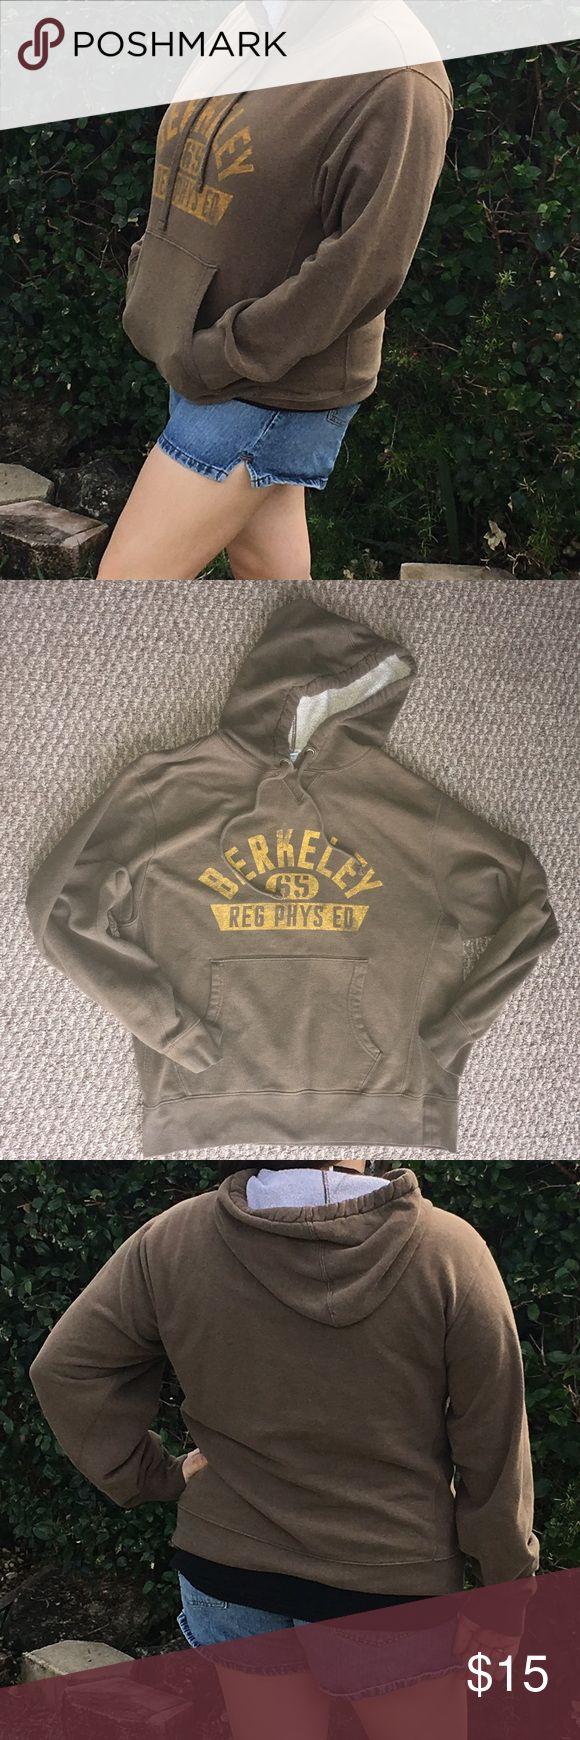 Berkeley Brown & Gold Boyfriend Hoodie Sweatshirt This is an Old Navy Men's size M or Women's XL Hoodie Sweatshirt. It is a comfy, boyfriend hoodie. Not heavy but will still keep you warm! Old Navy Tops Sweatshirts & Hoodies